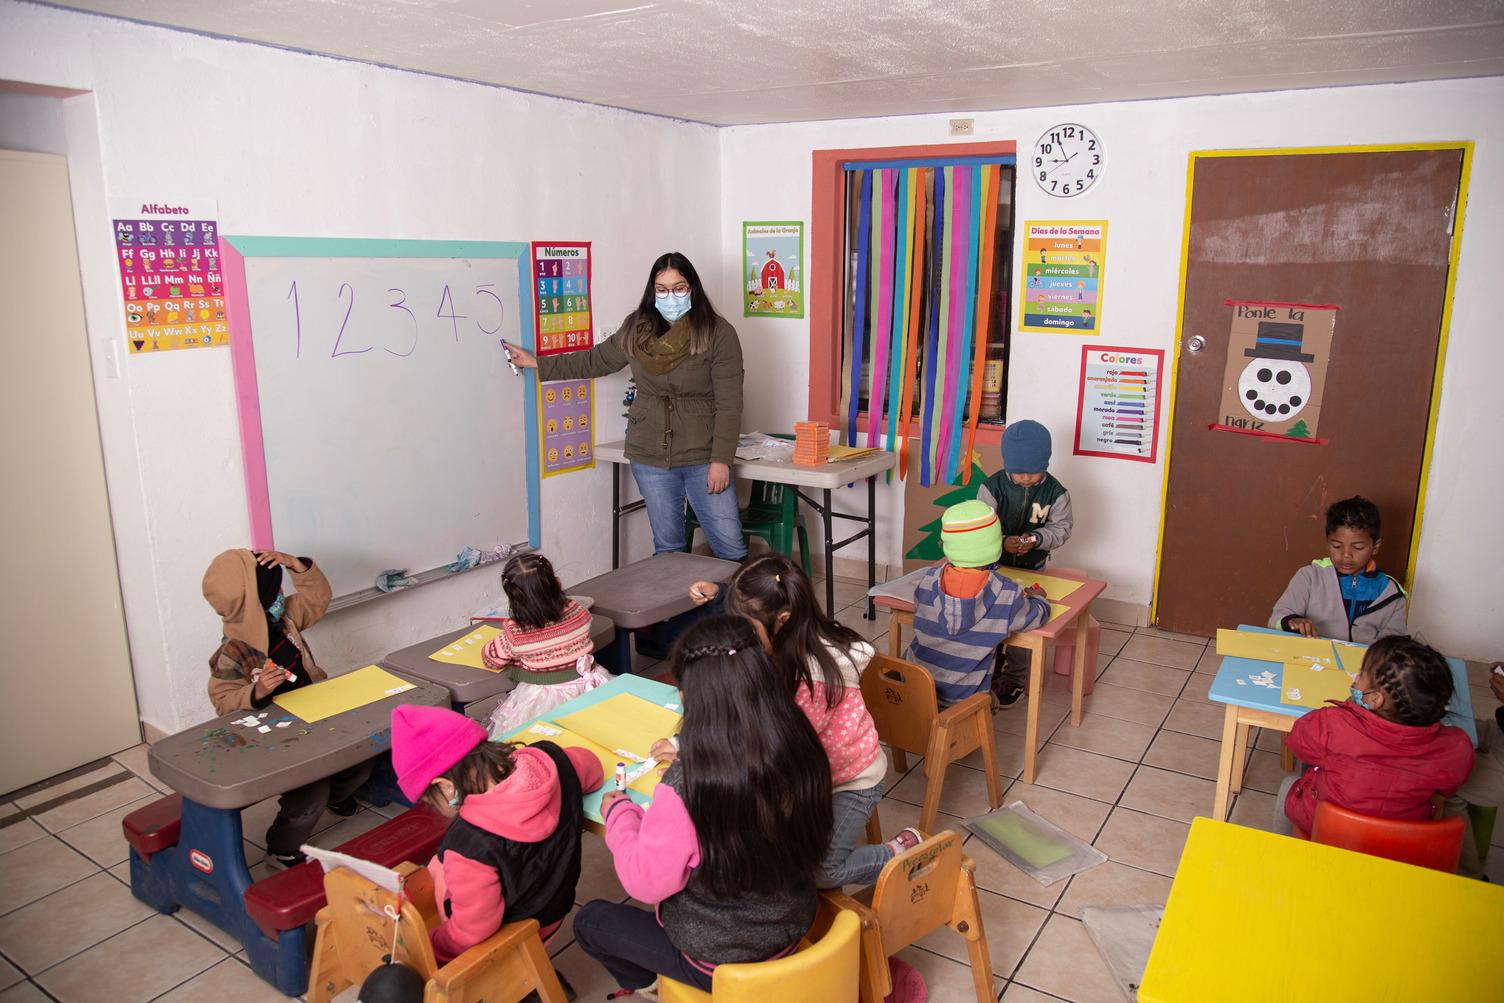 Children learning in a school room